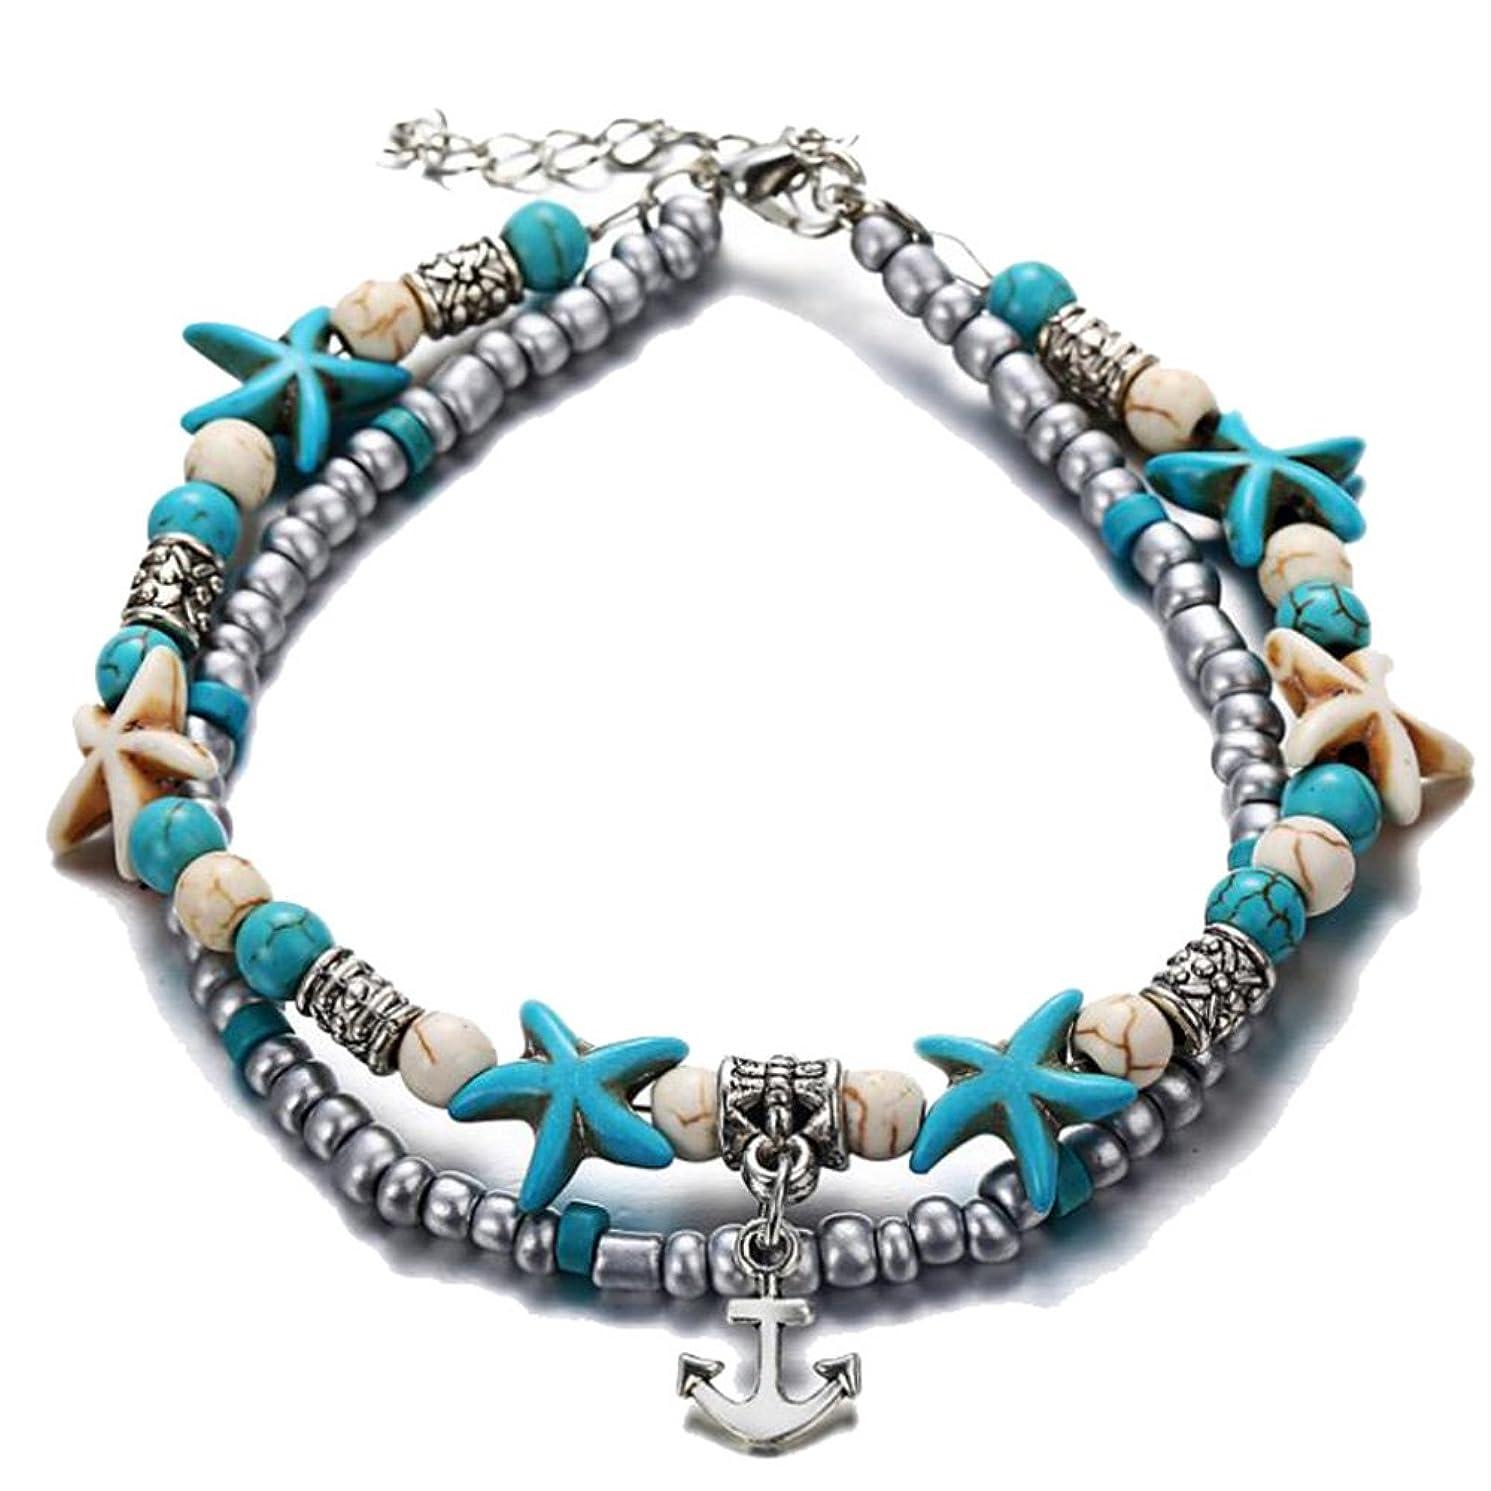 TTPAIAI 30 Starfish Anklets Bracelet for Women Girls Beads Beach Boho Foot Jewelry